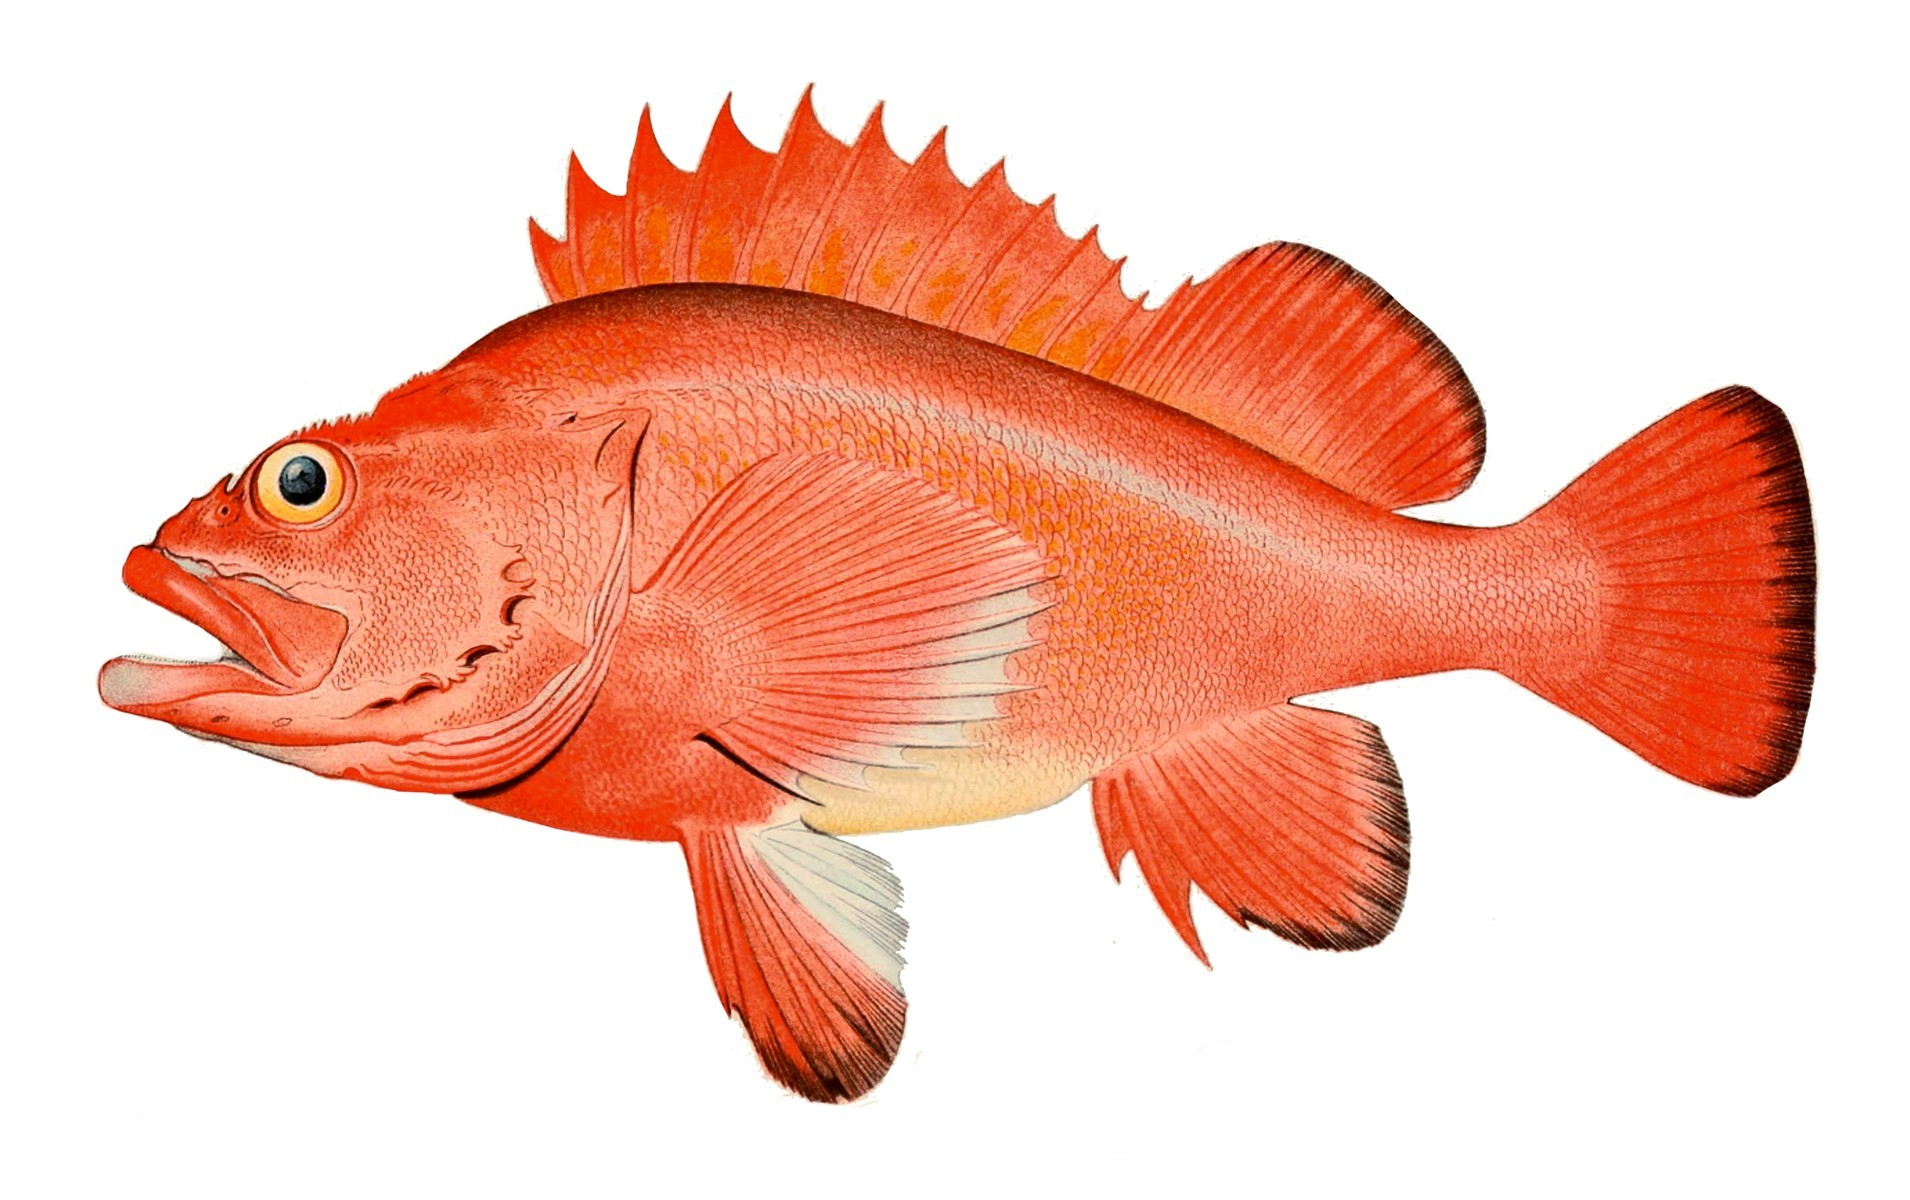 (Foto: Wikimedia/Bulletin of the United States Fish Commission)